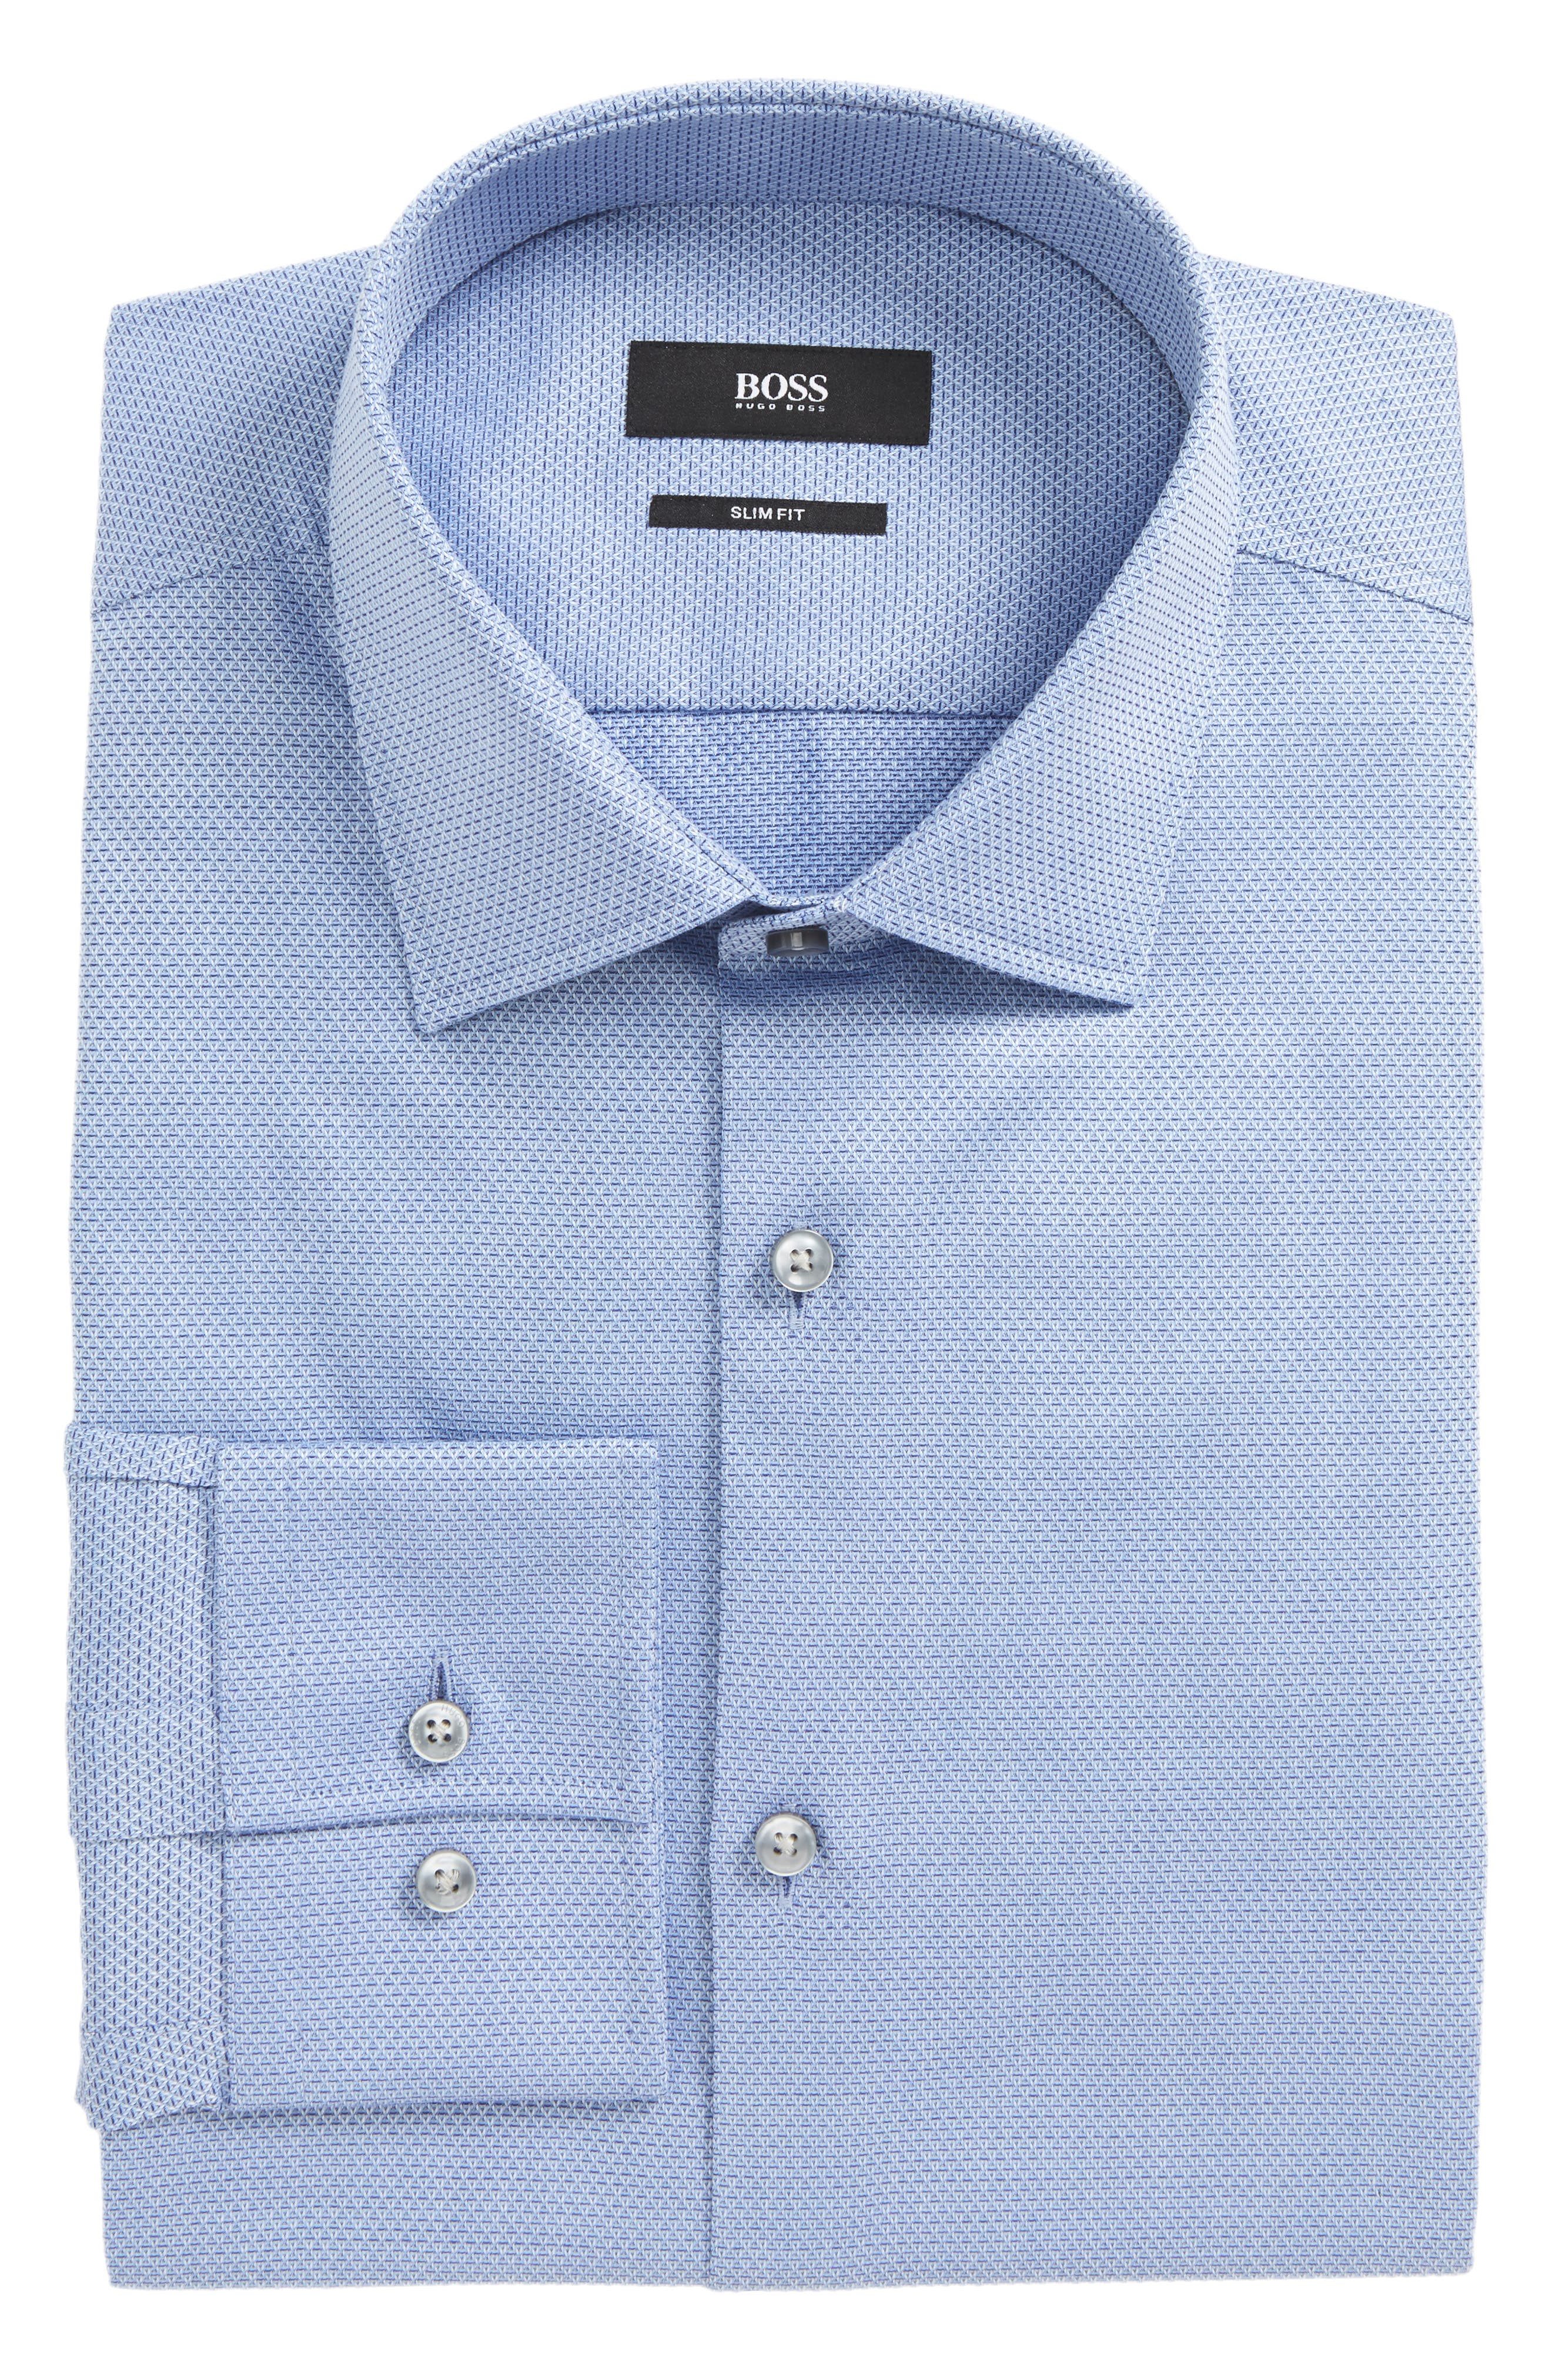 Jenno Slim Fit Textured Dress Shirt,                             Main thumbnail 1, color,